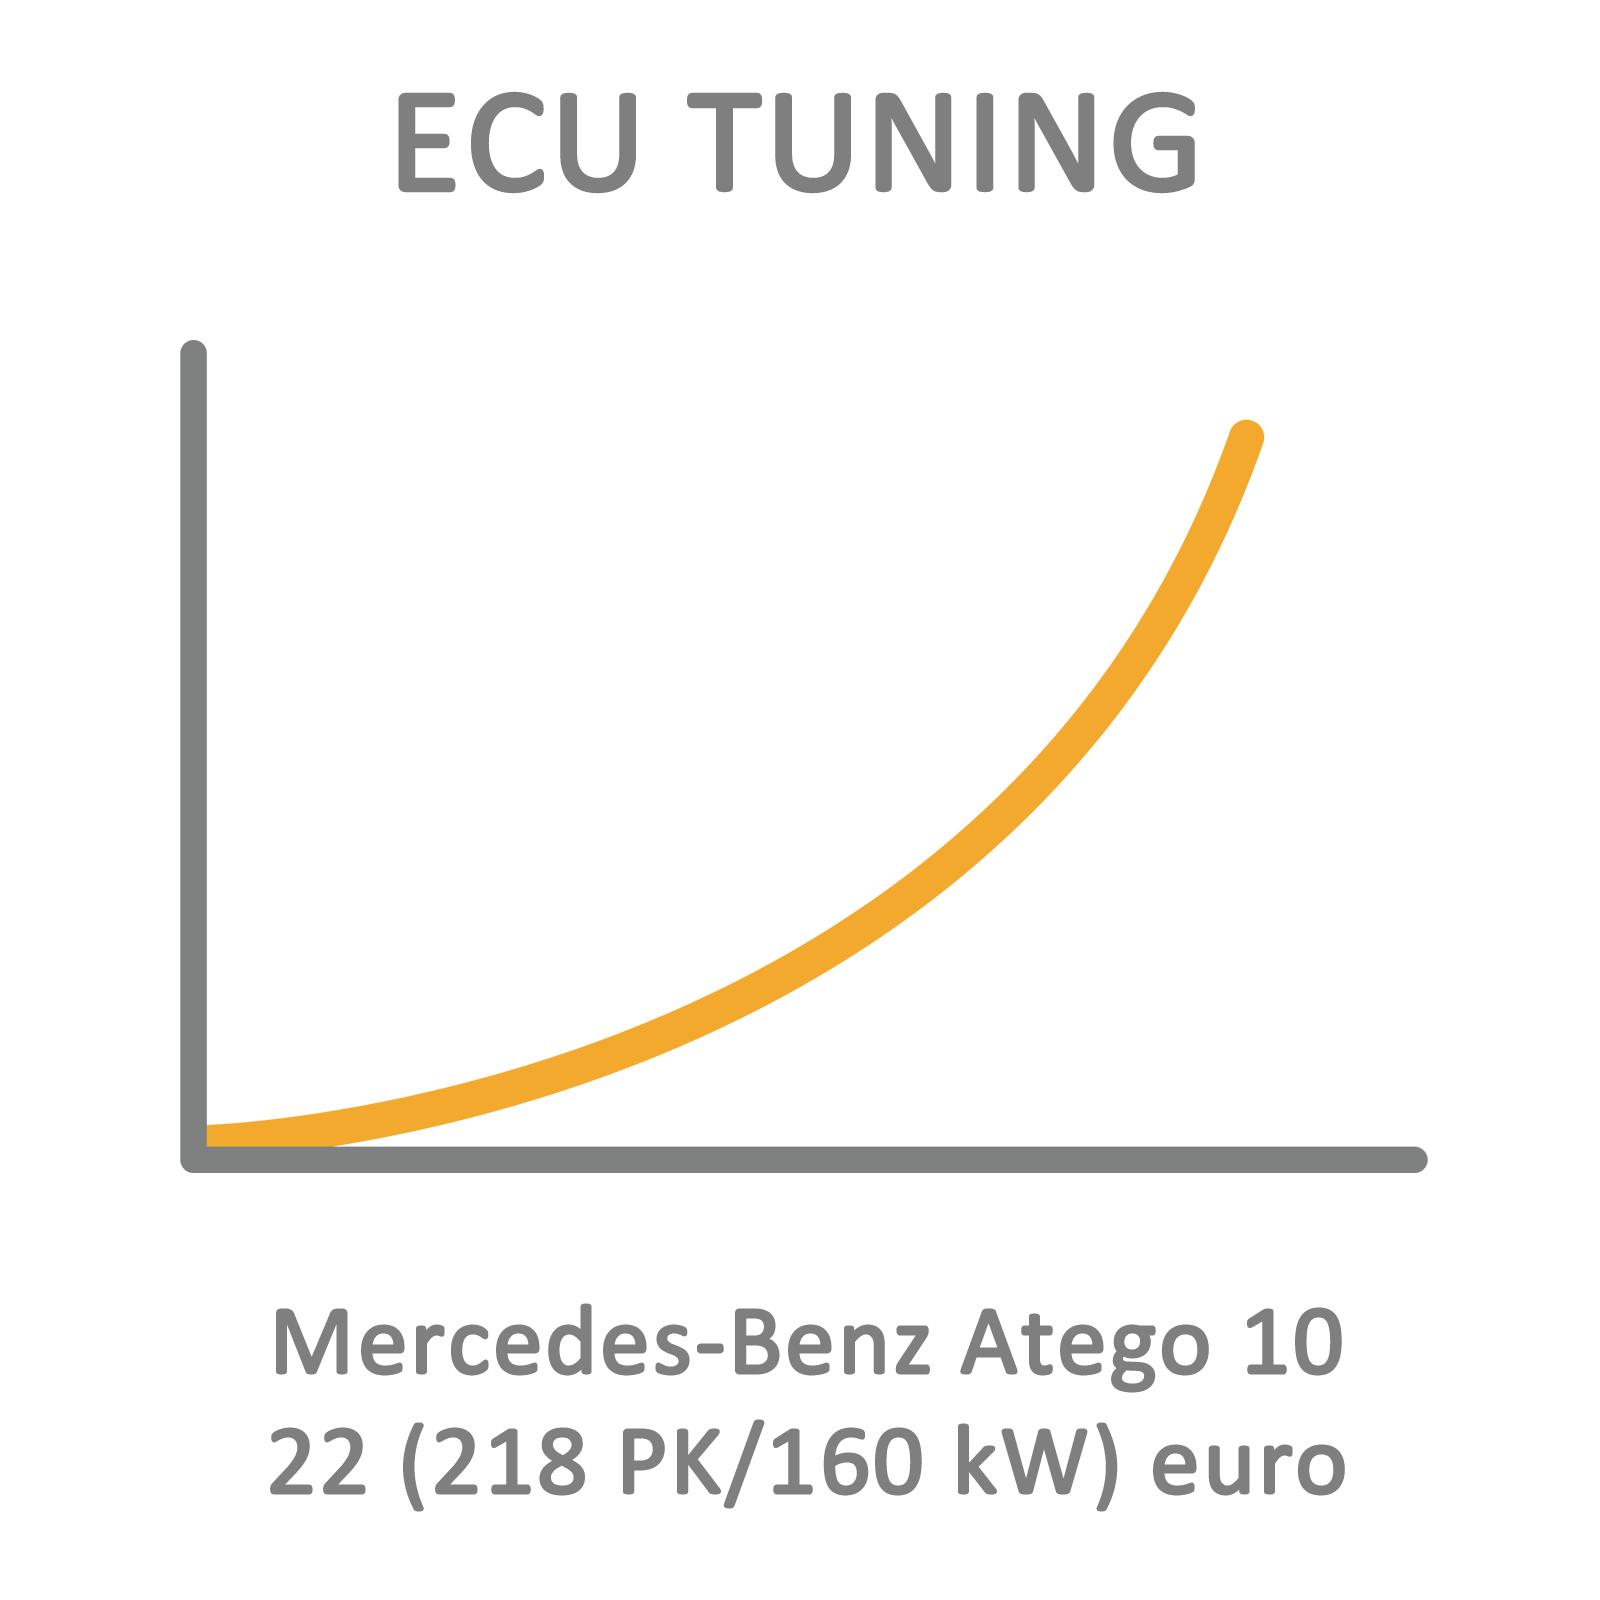 Mercedes-Benz Atego 10 22 (218 PK/160 kW) euro 3+4+5 ECU